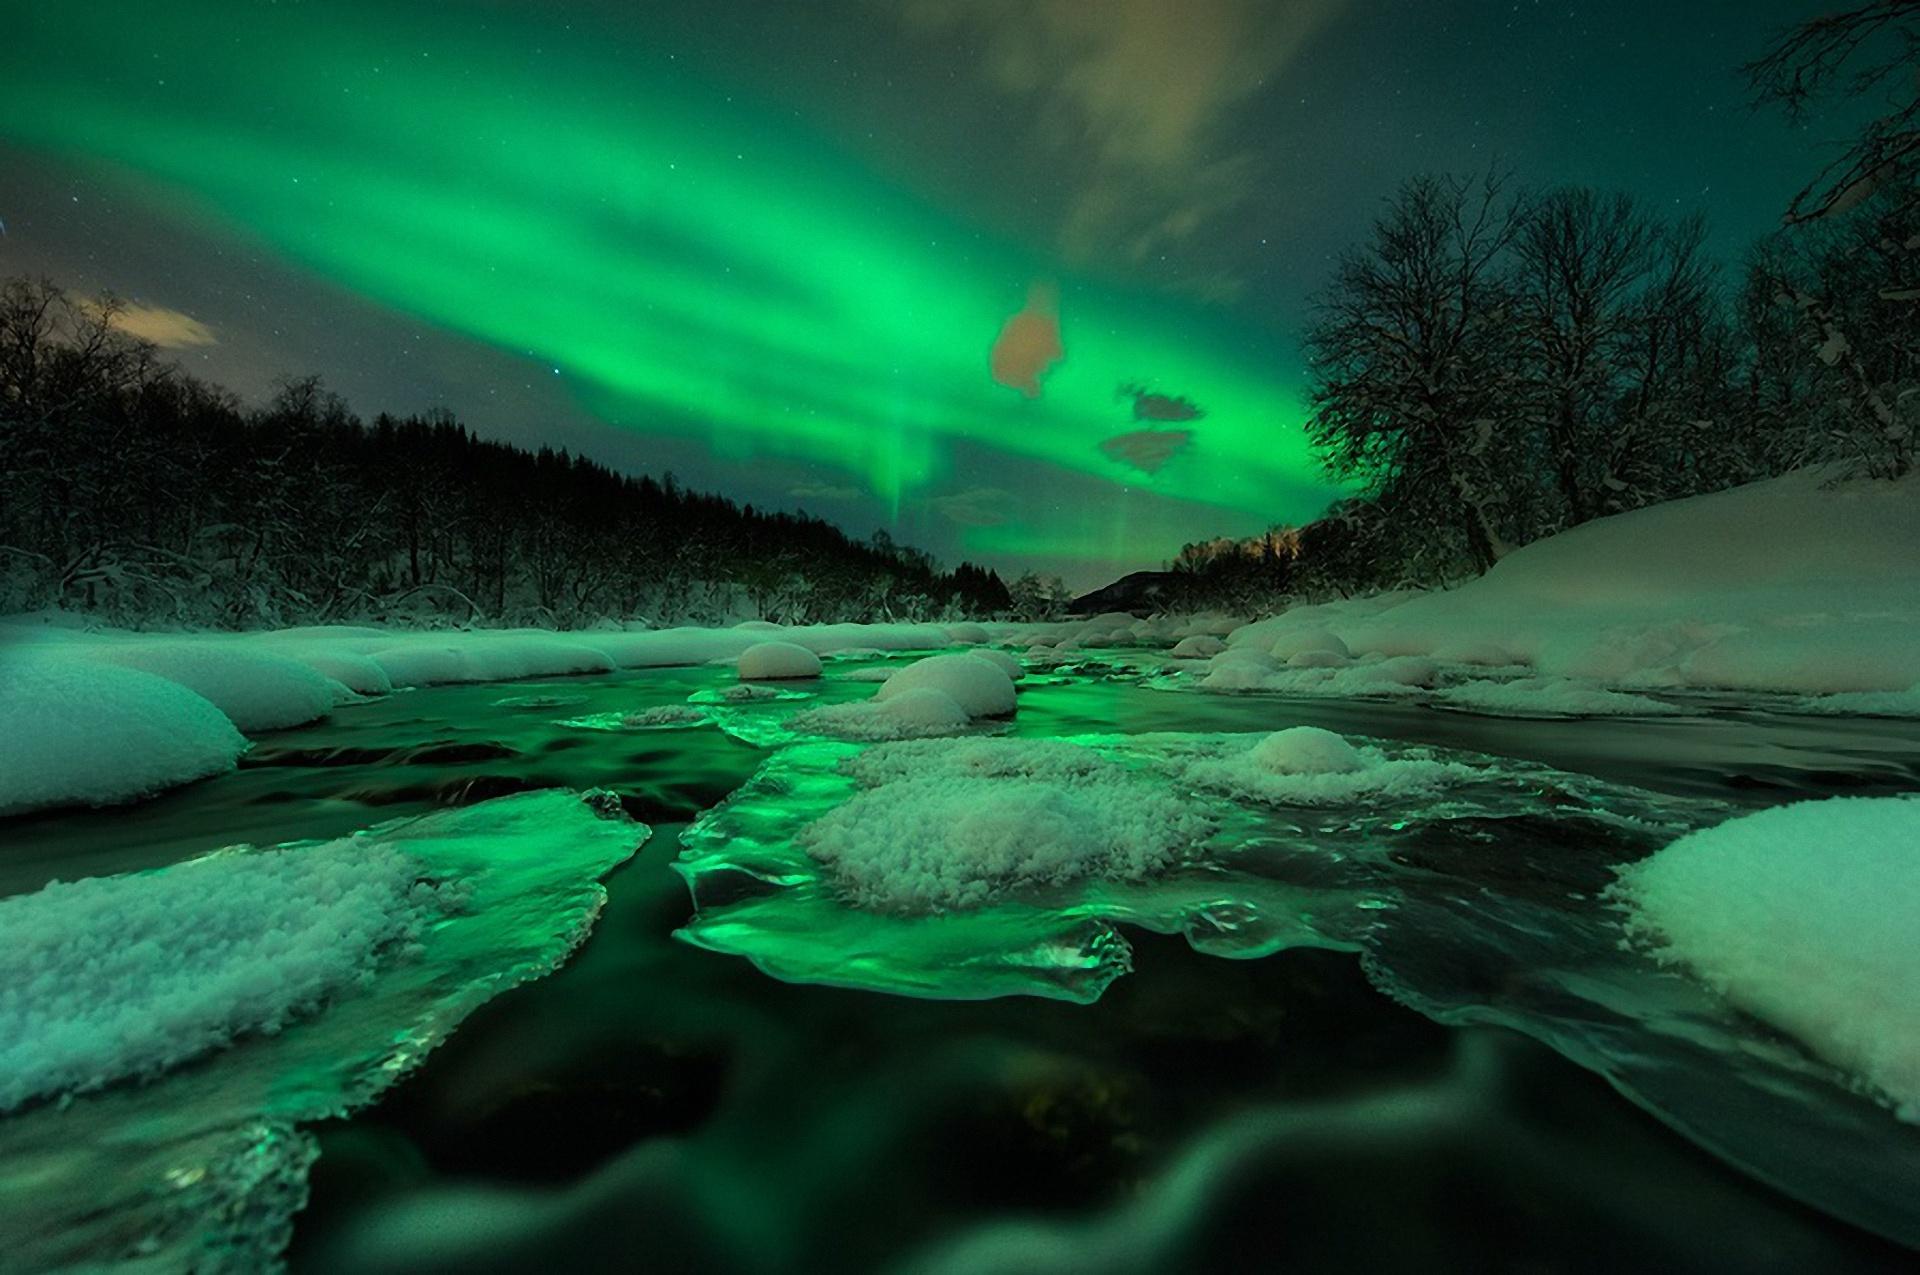 Aurora Borealis Wallpapers | Sky HD Wallpaper